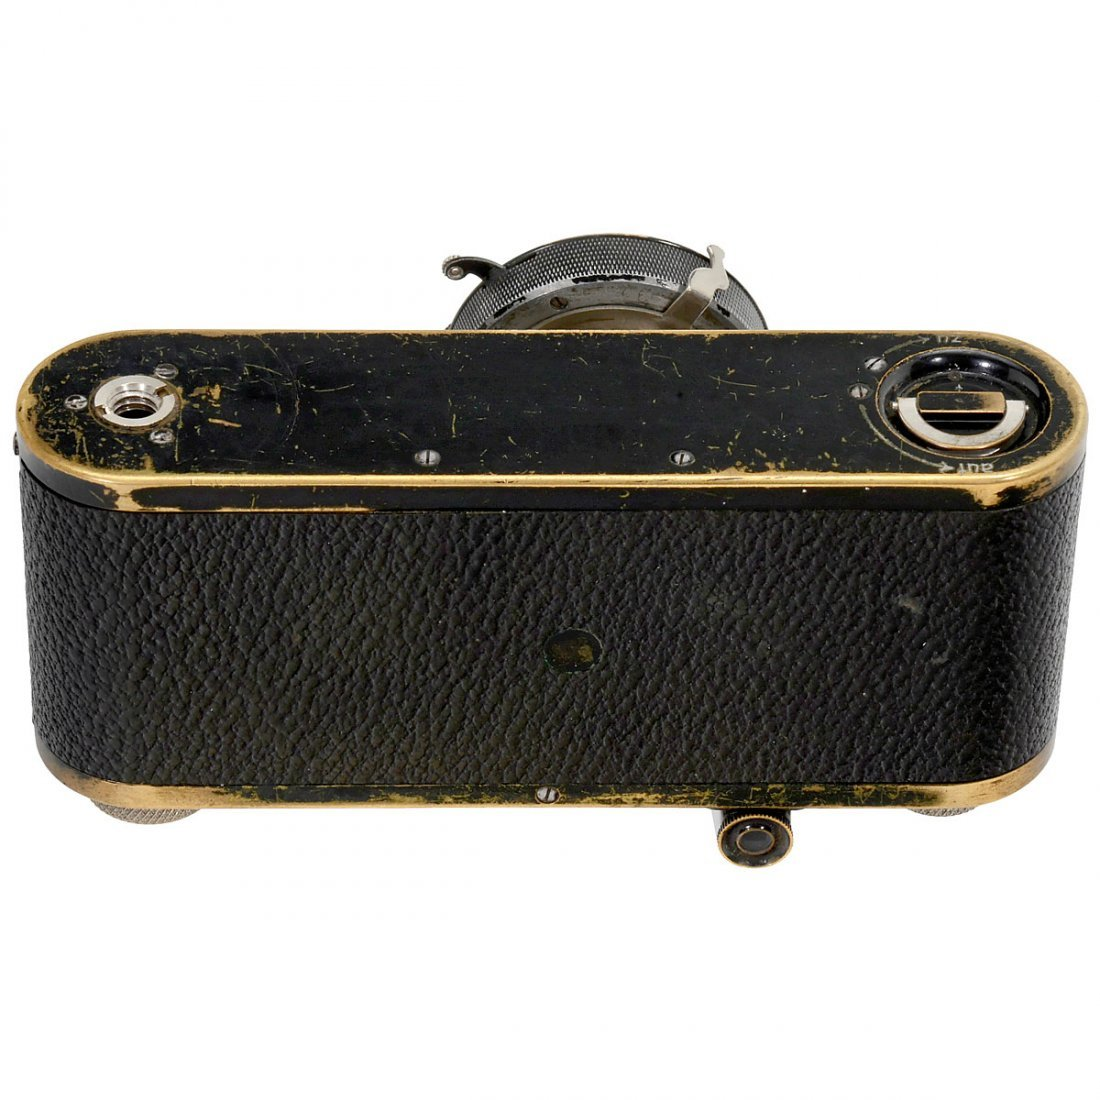 Leica with Dial-Set Compur Shutter, 1931 - 3